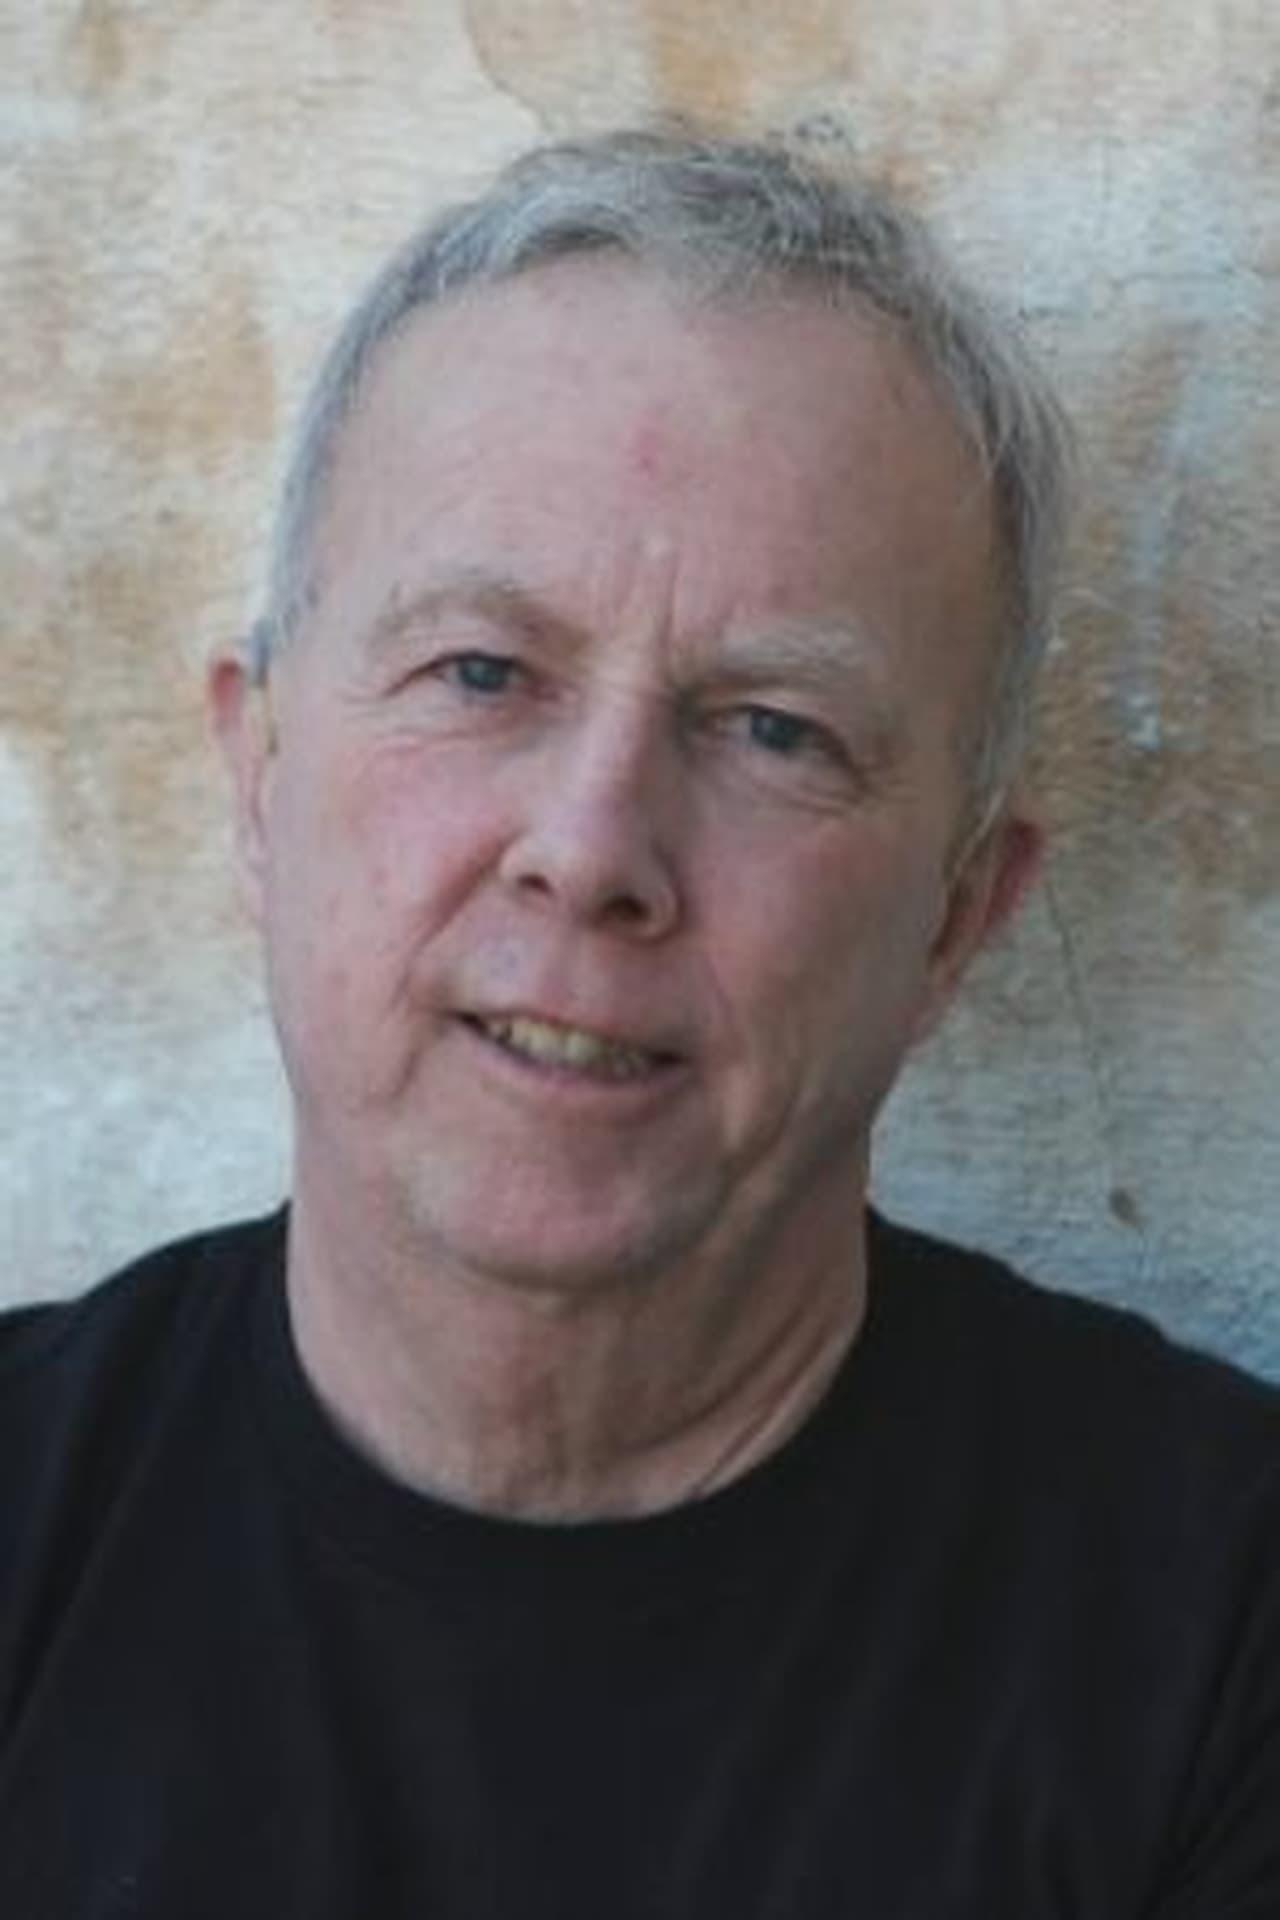 Colin Michael Kitchens